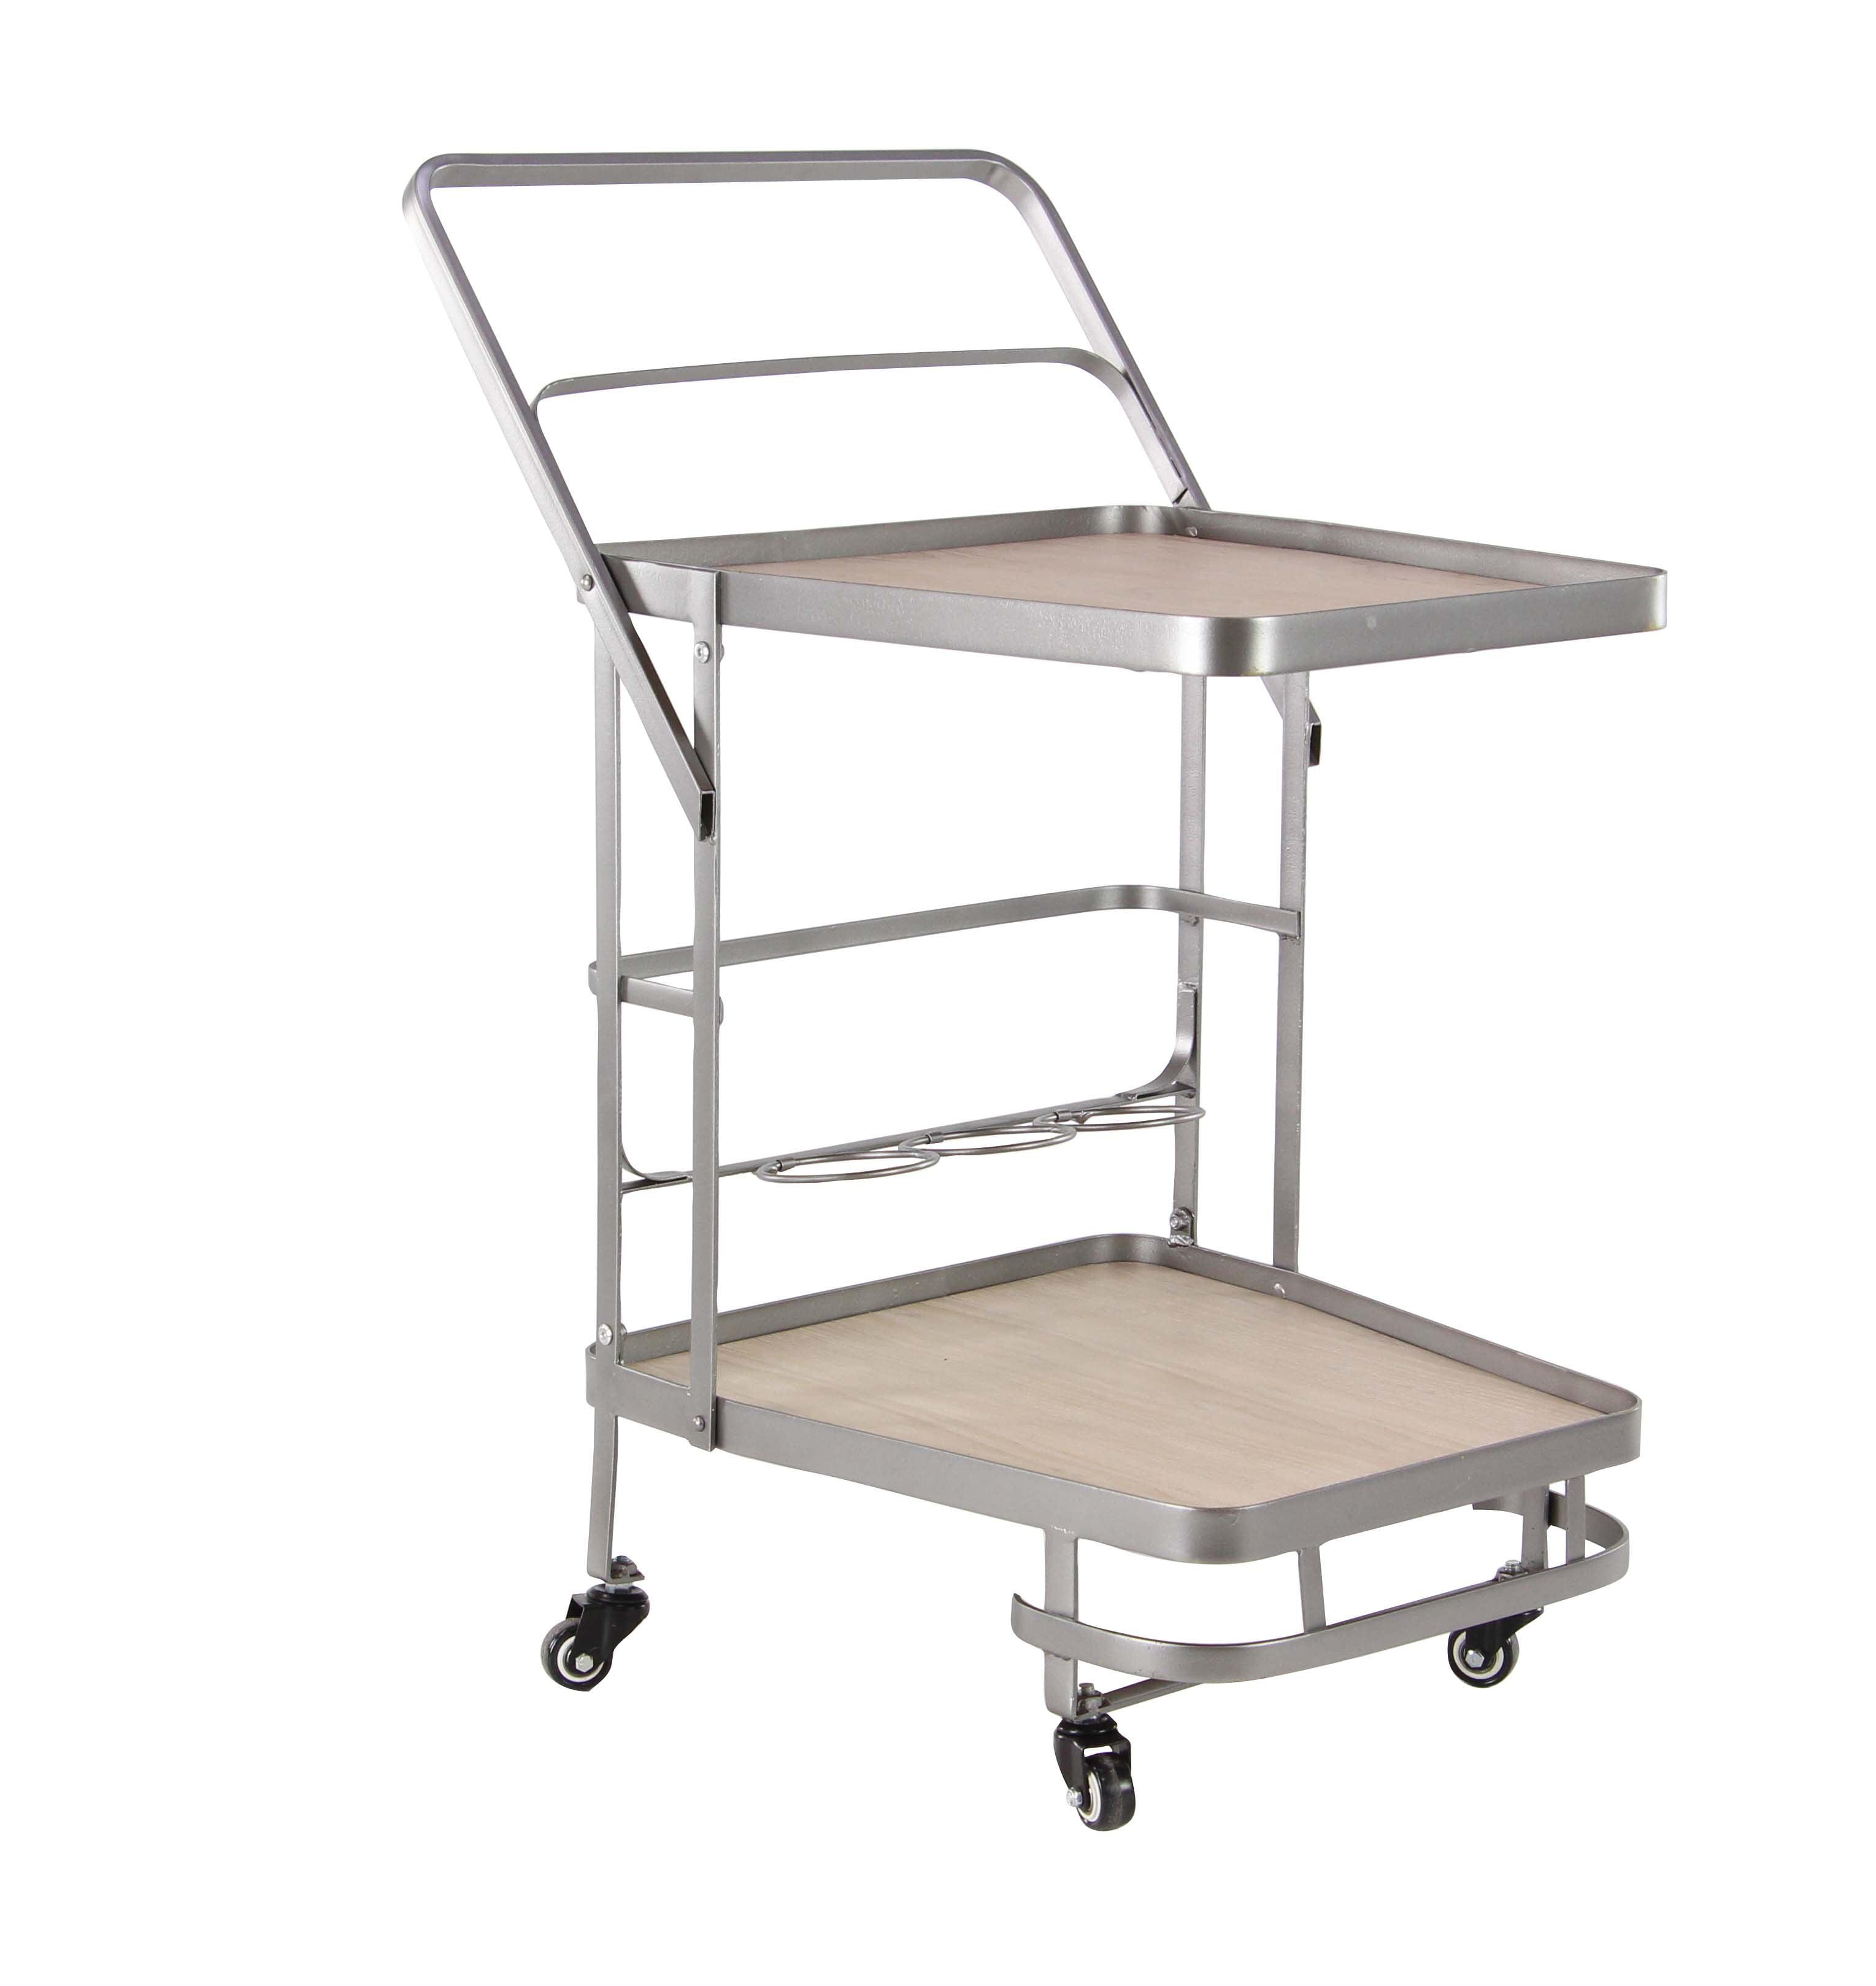 Decmode Modern Wood and Iron Two-Shelf Cart, Light Brown